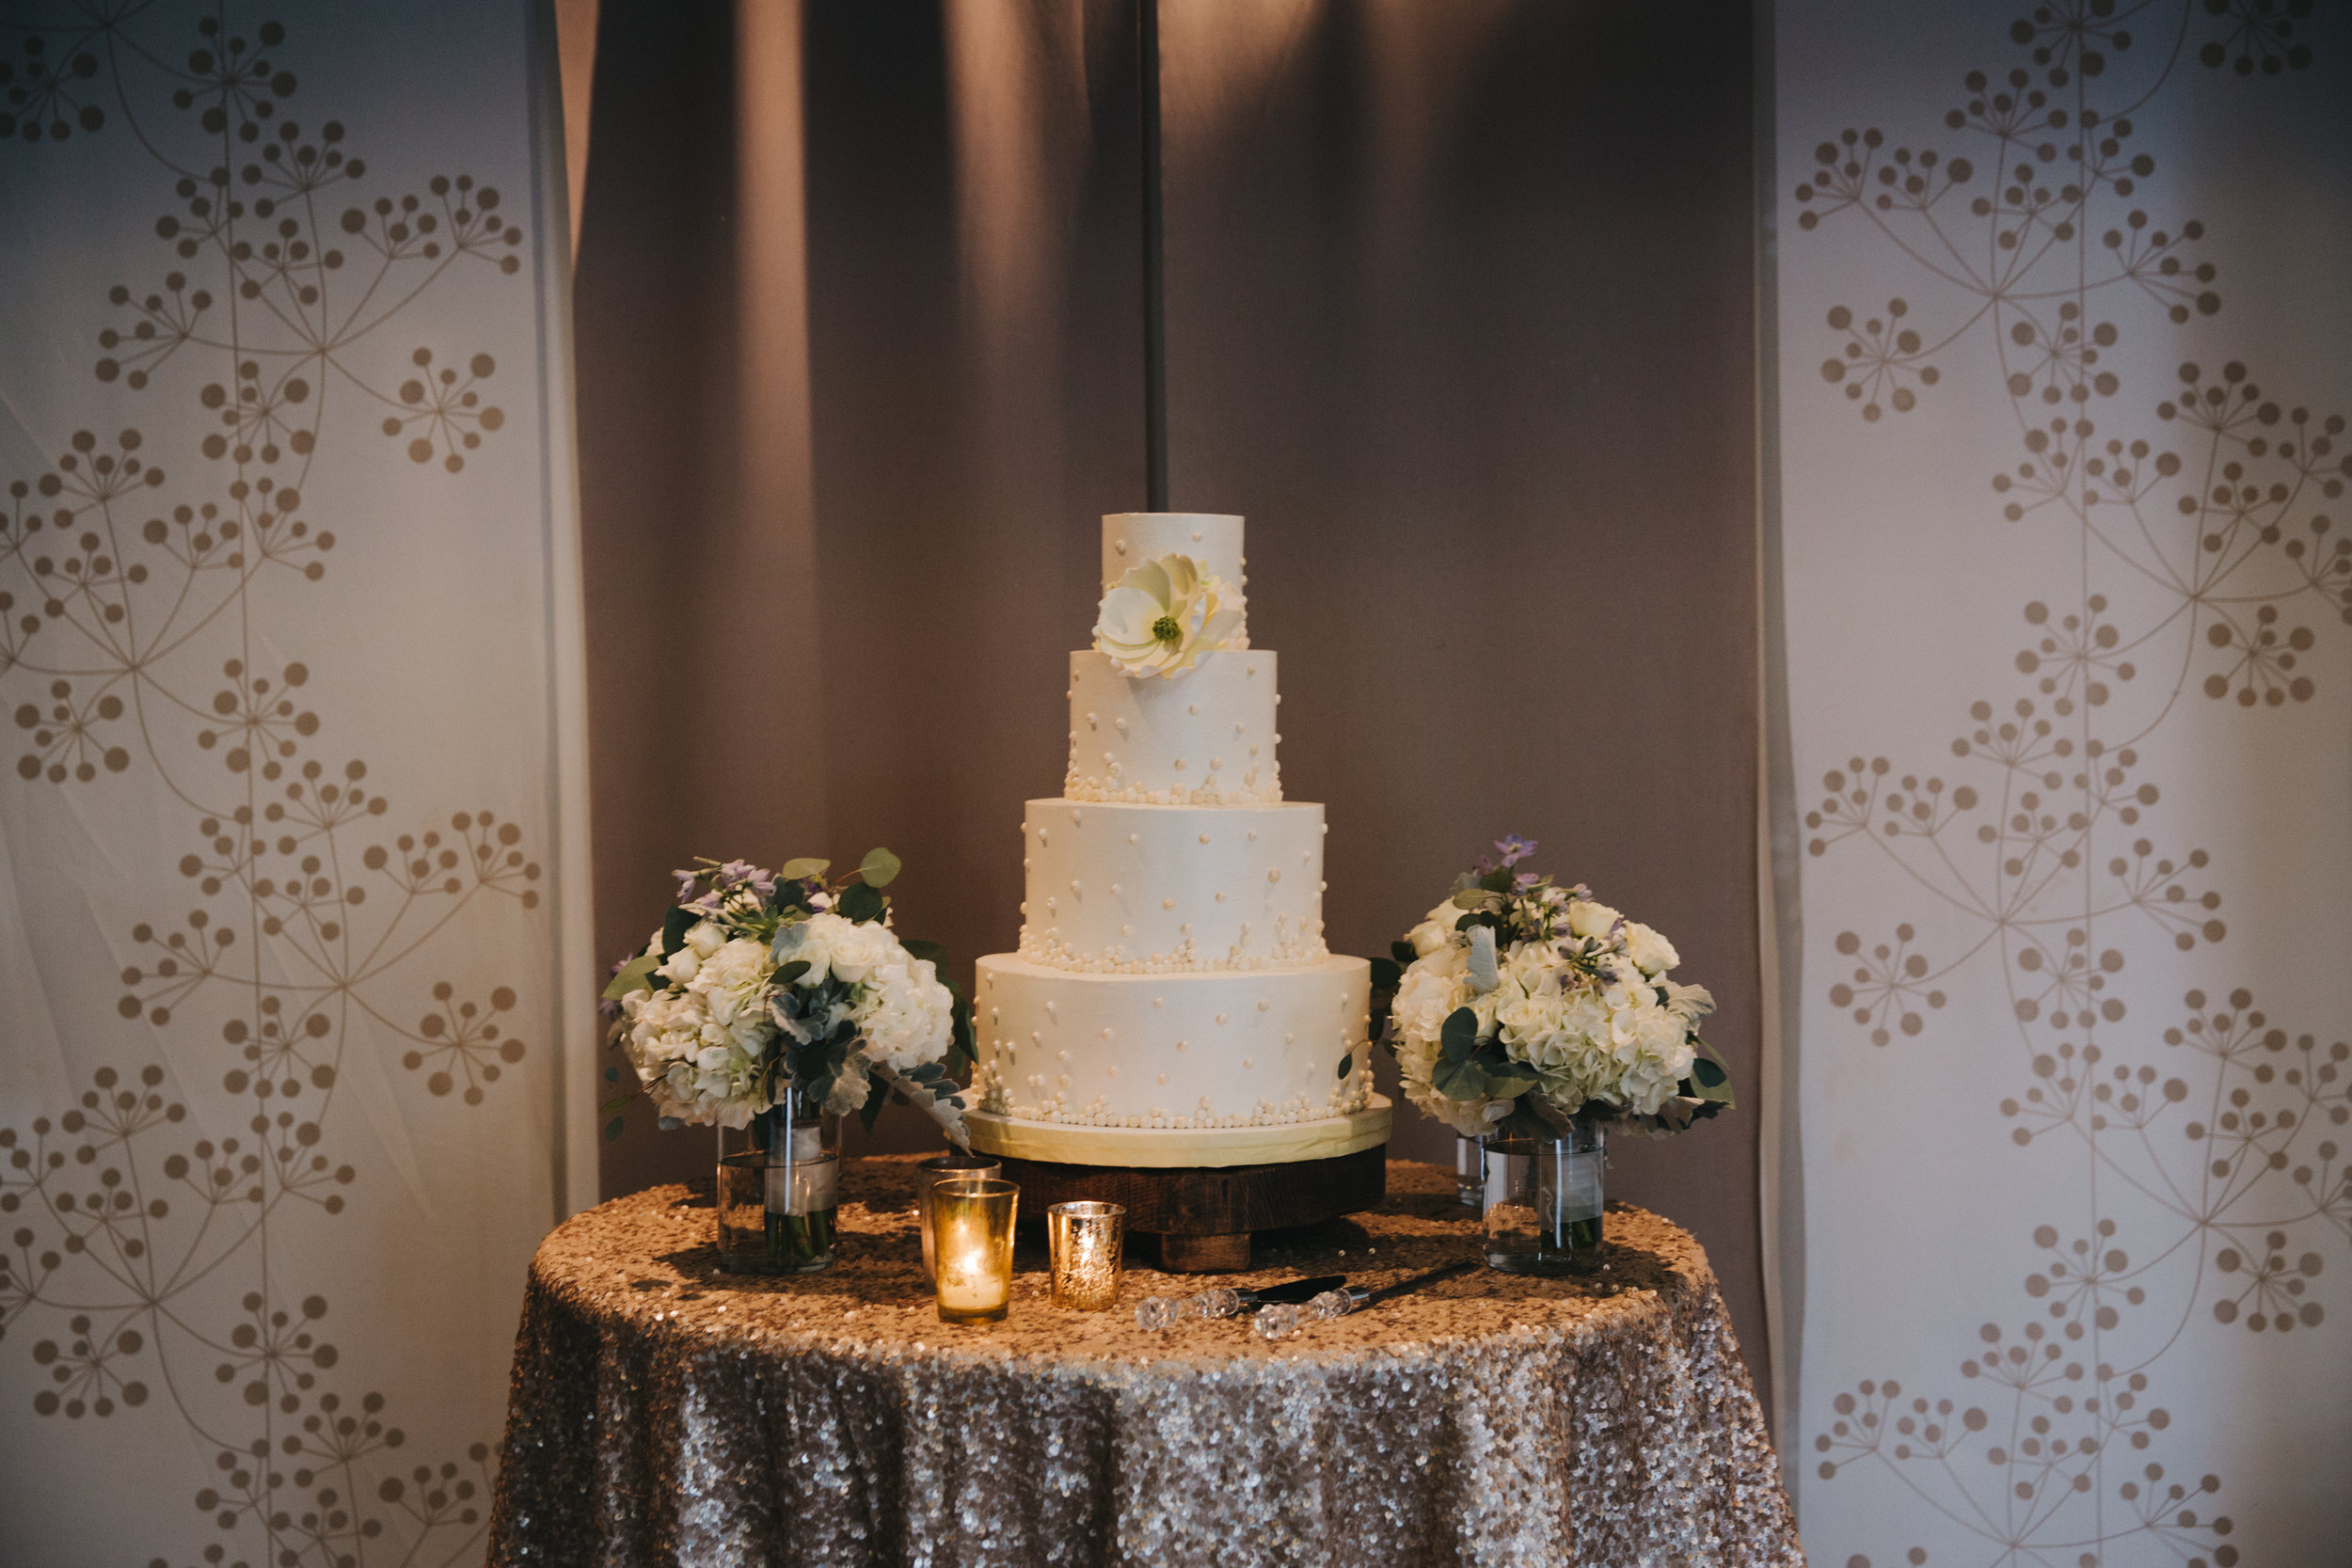 Cake Table 1.jpg